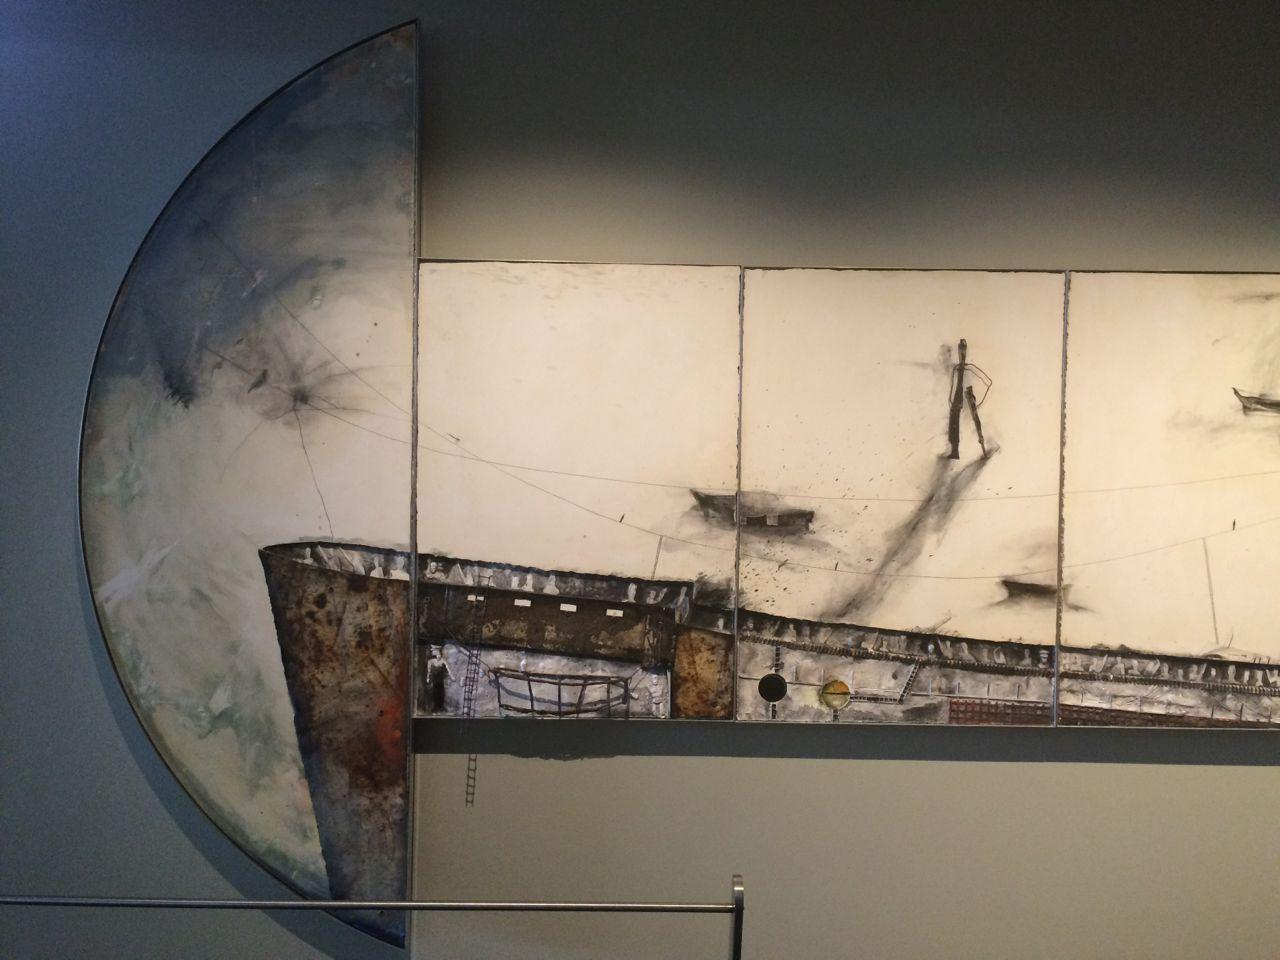 Detail, La Rayuela (Emigrar 2000), 2001, Gustavo Lopez Armentia